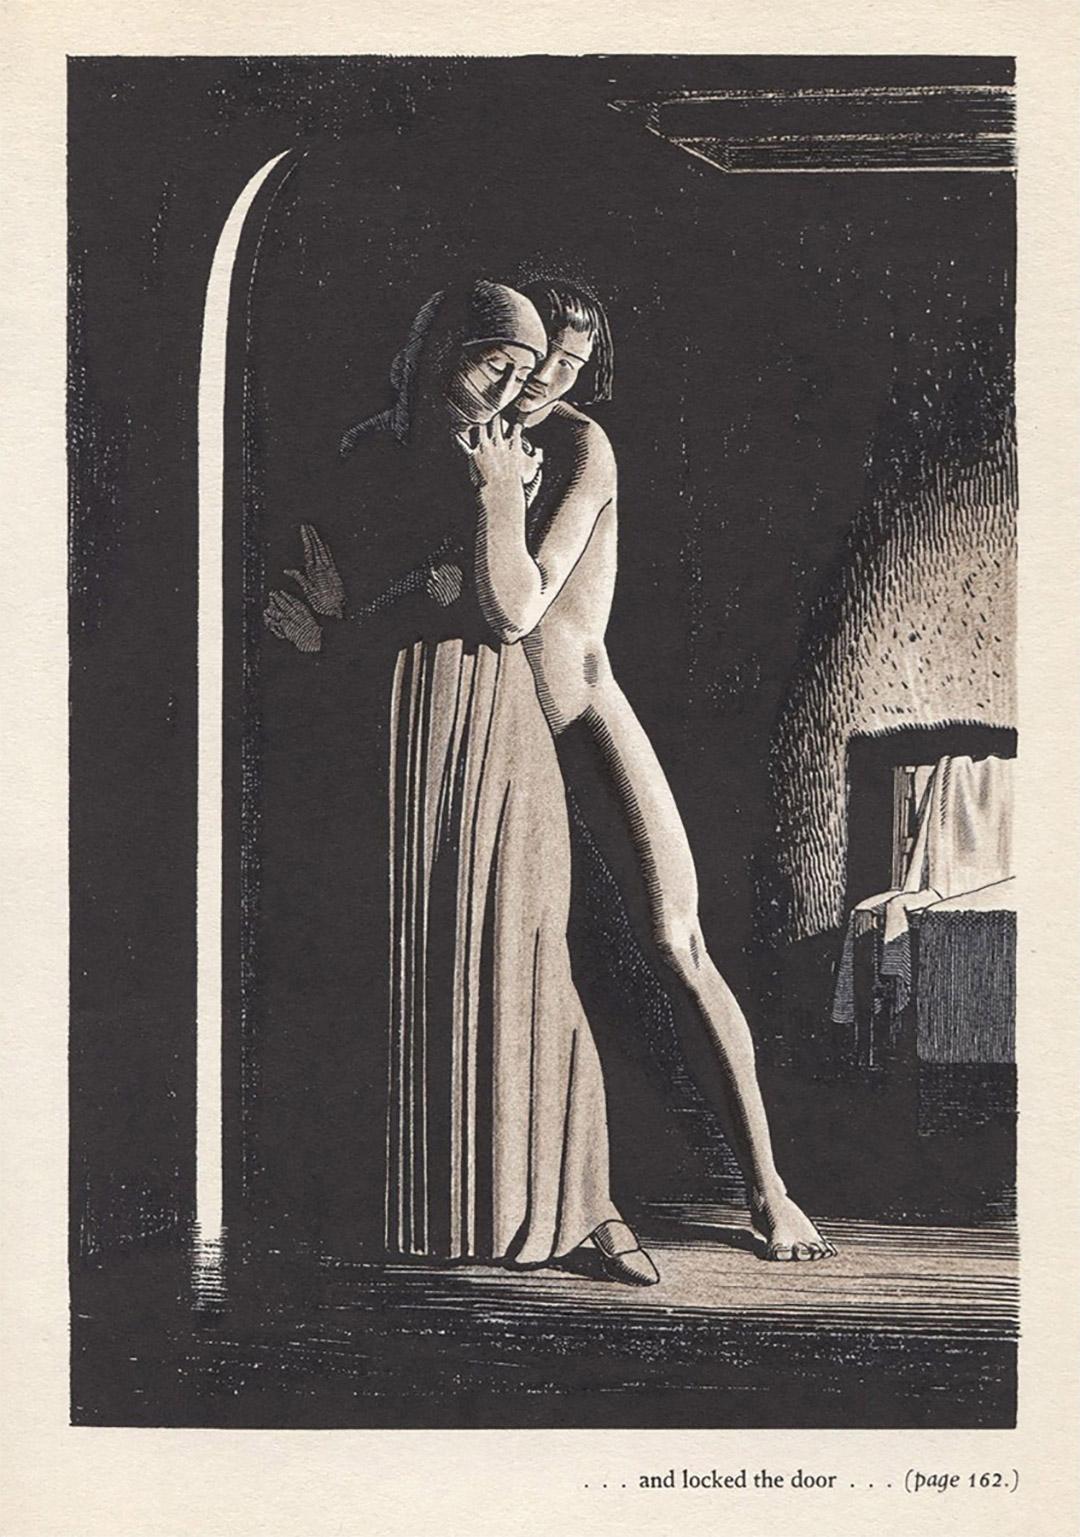 Иллюстрация к книге Джованни Боккаччо «Декамерон», художник Рокуэлл Кент, 1949. Источник: William Augustus Brewer Bookplate Collection